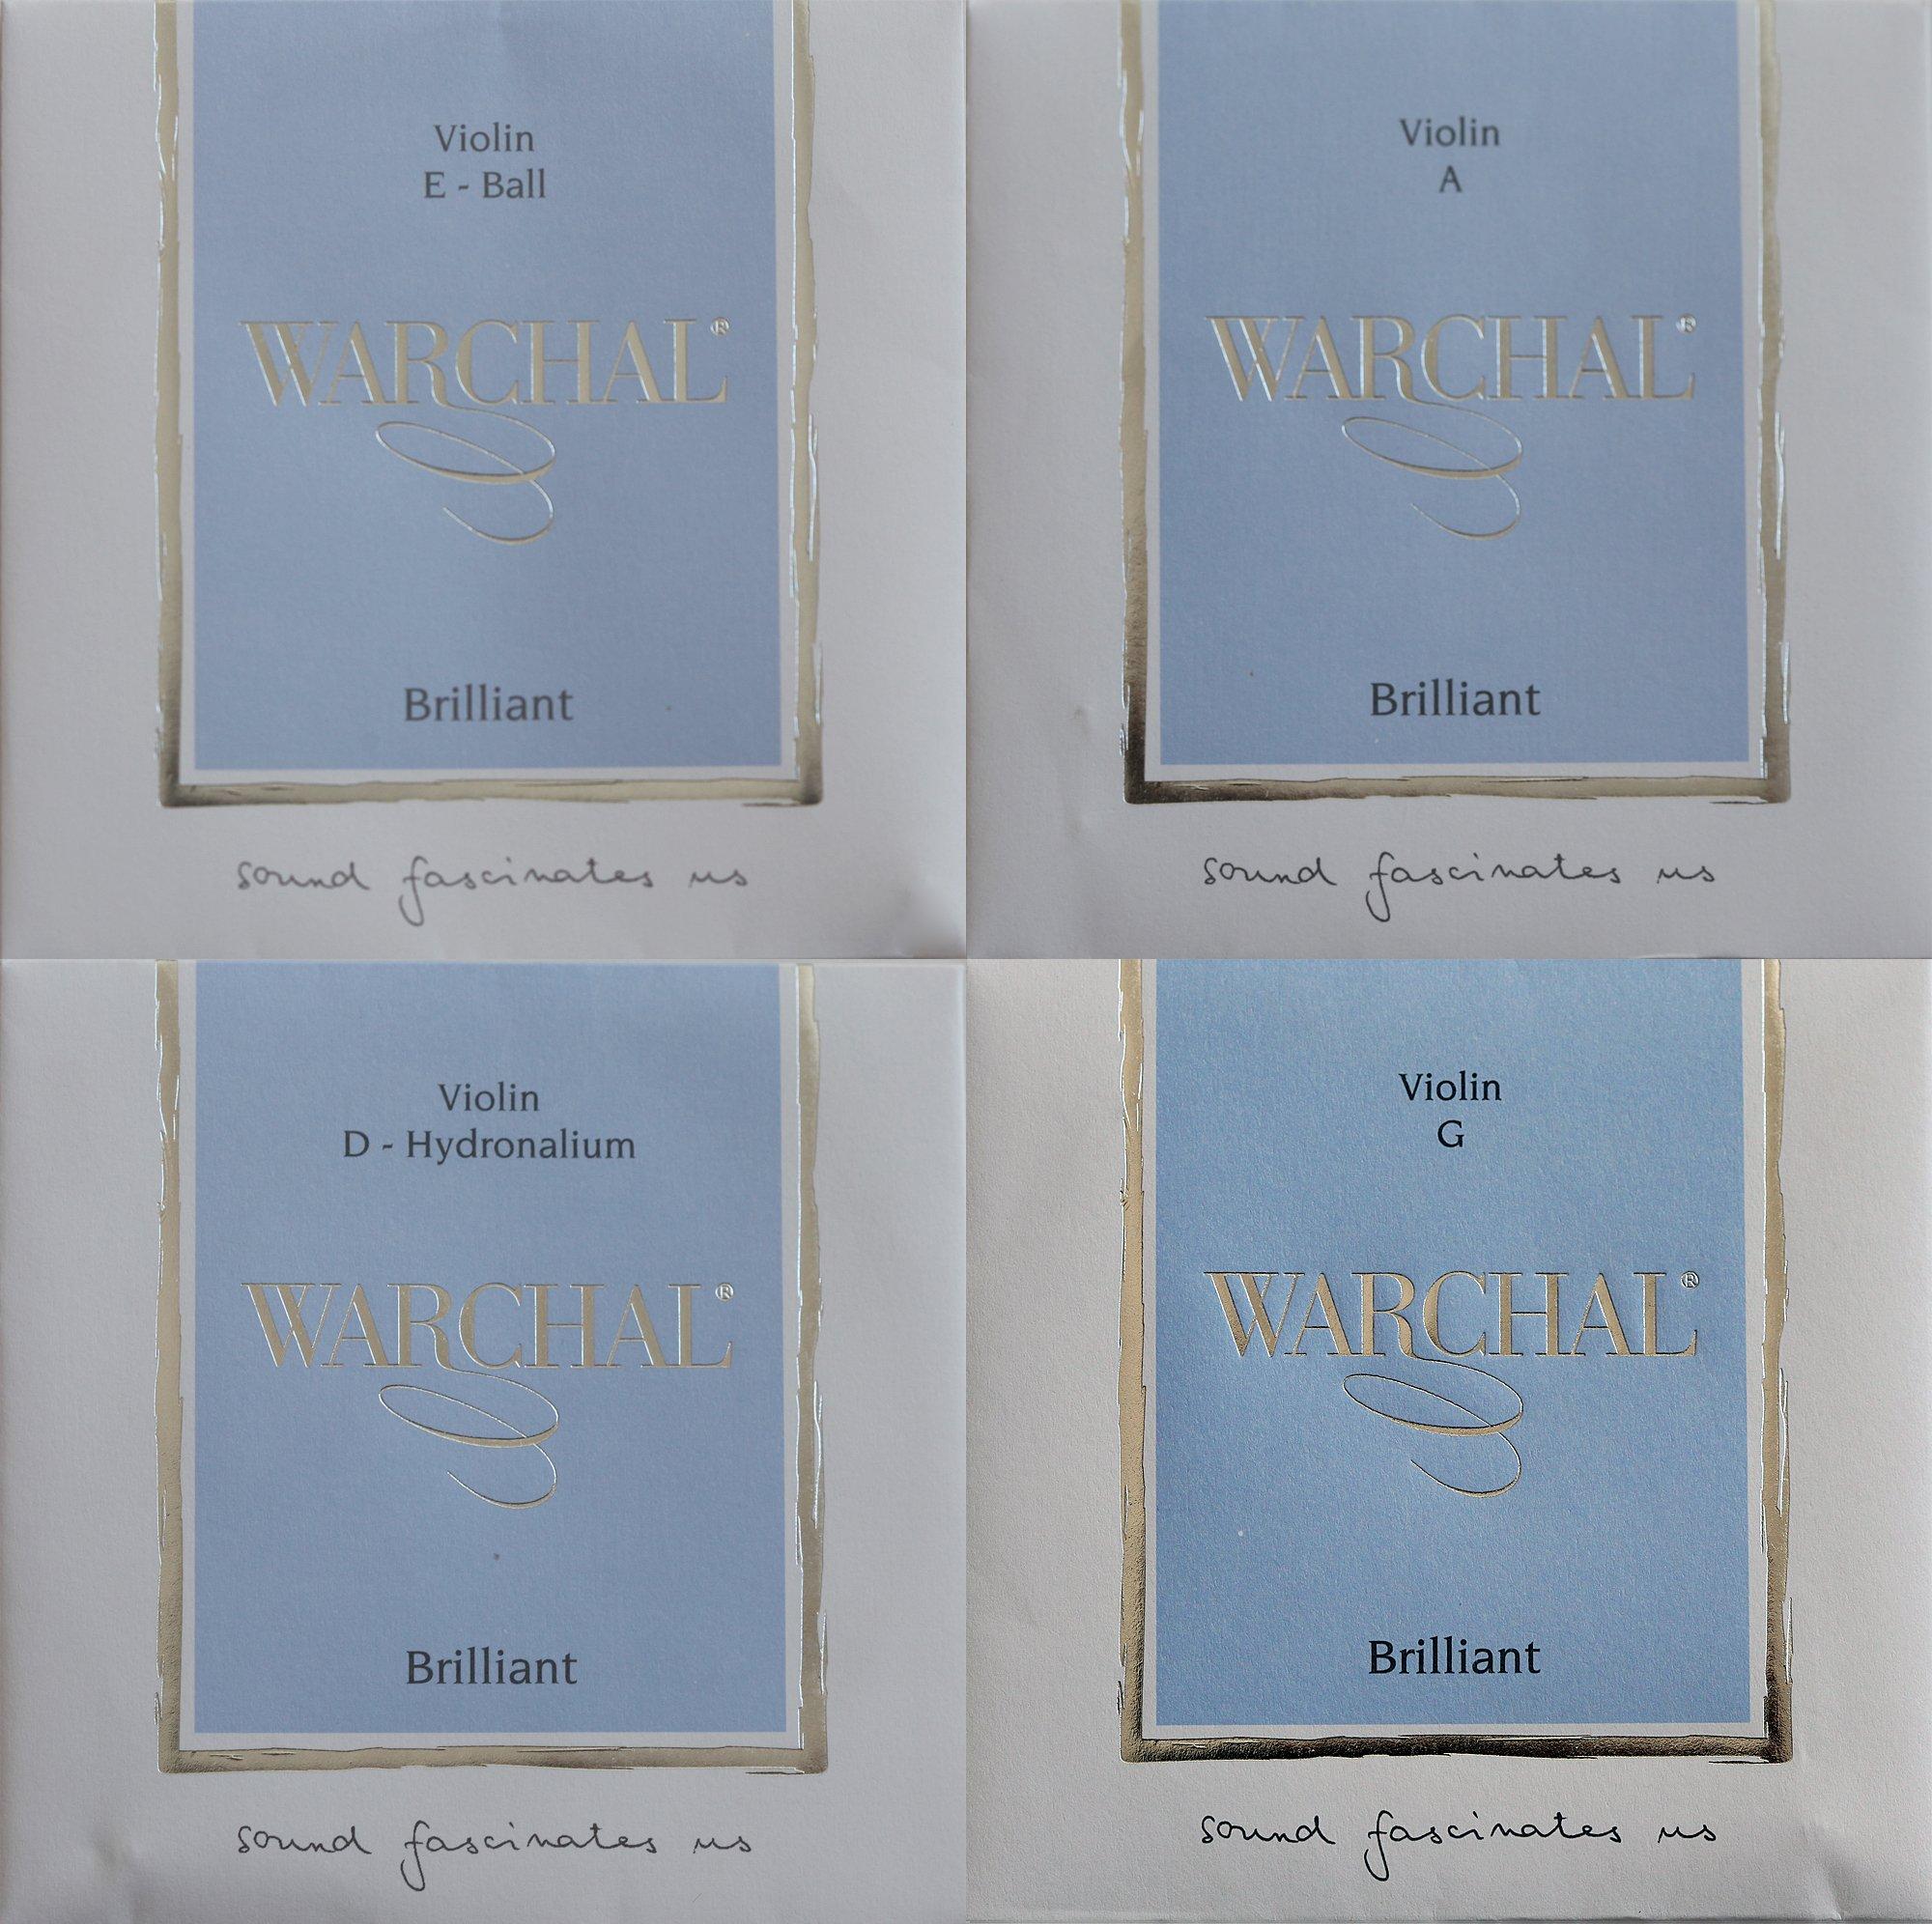 Warchal Brilliant 4/4 Violin String Set / Hydronalium D / Ball end E